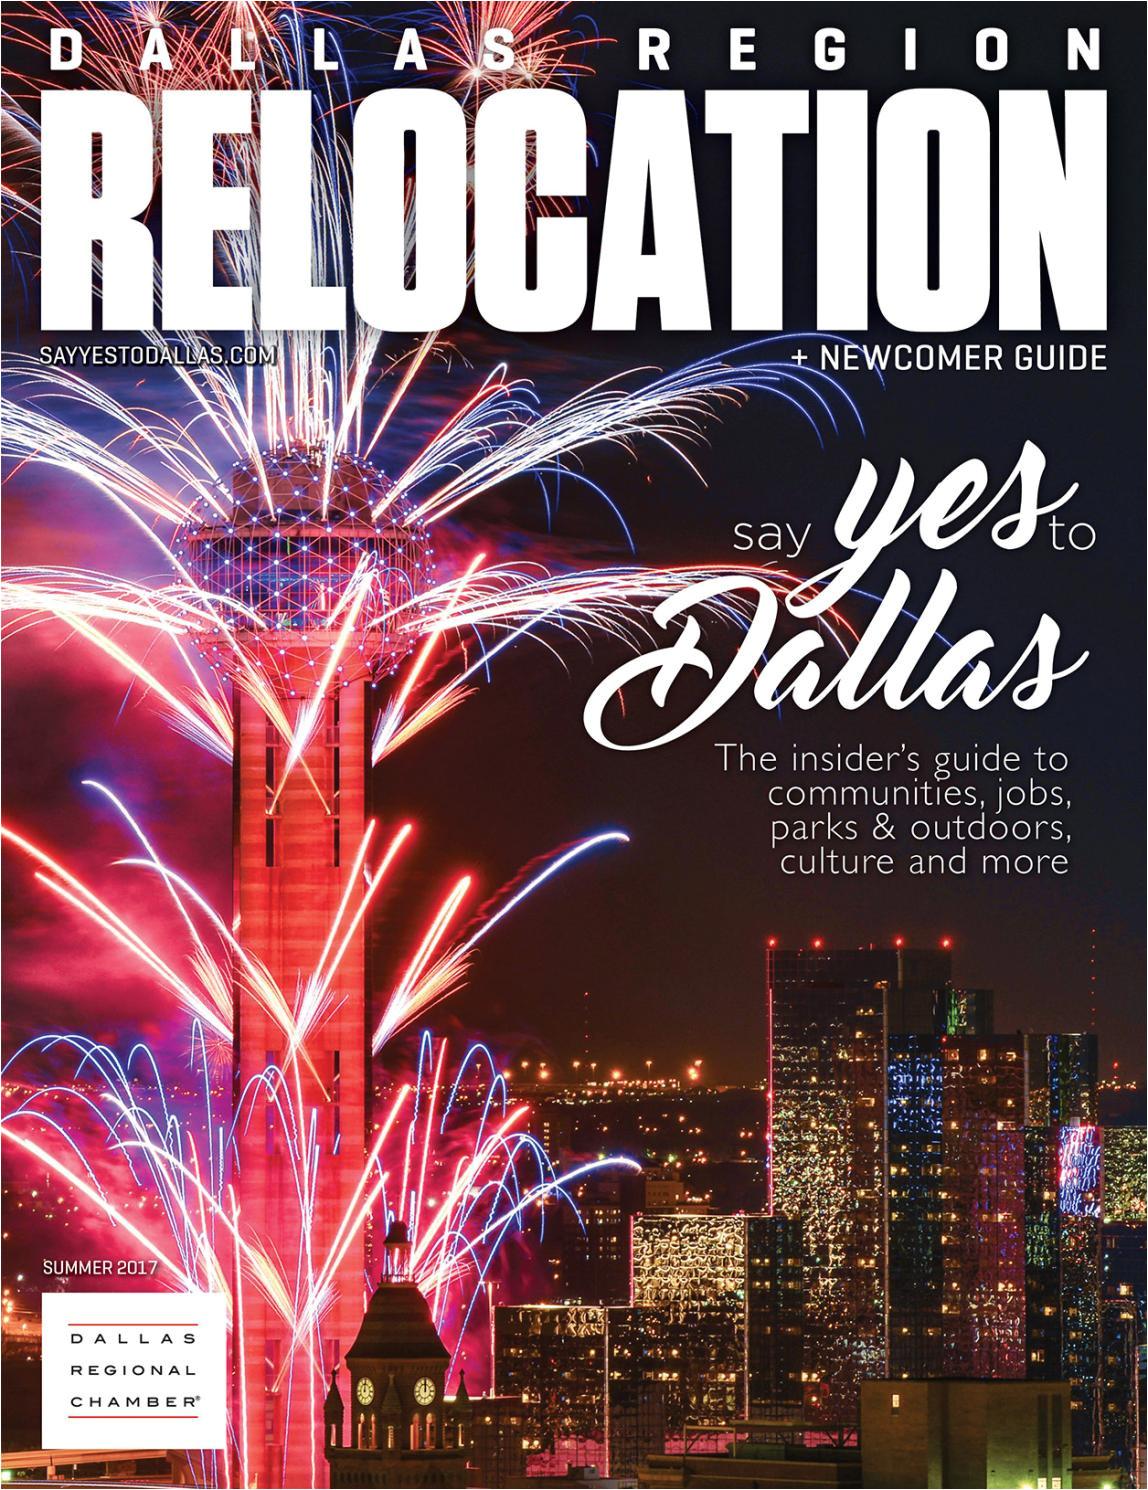 dallas region relocation newcomer guide by dallas regional chamber publications issuu